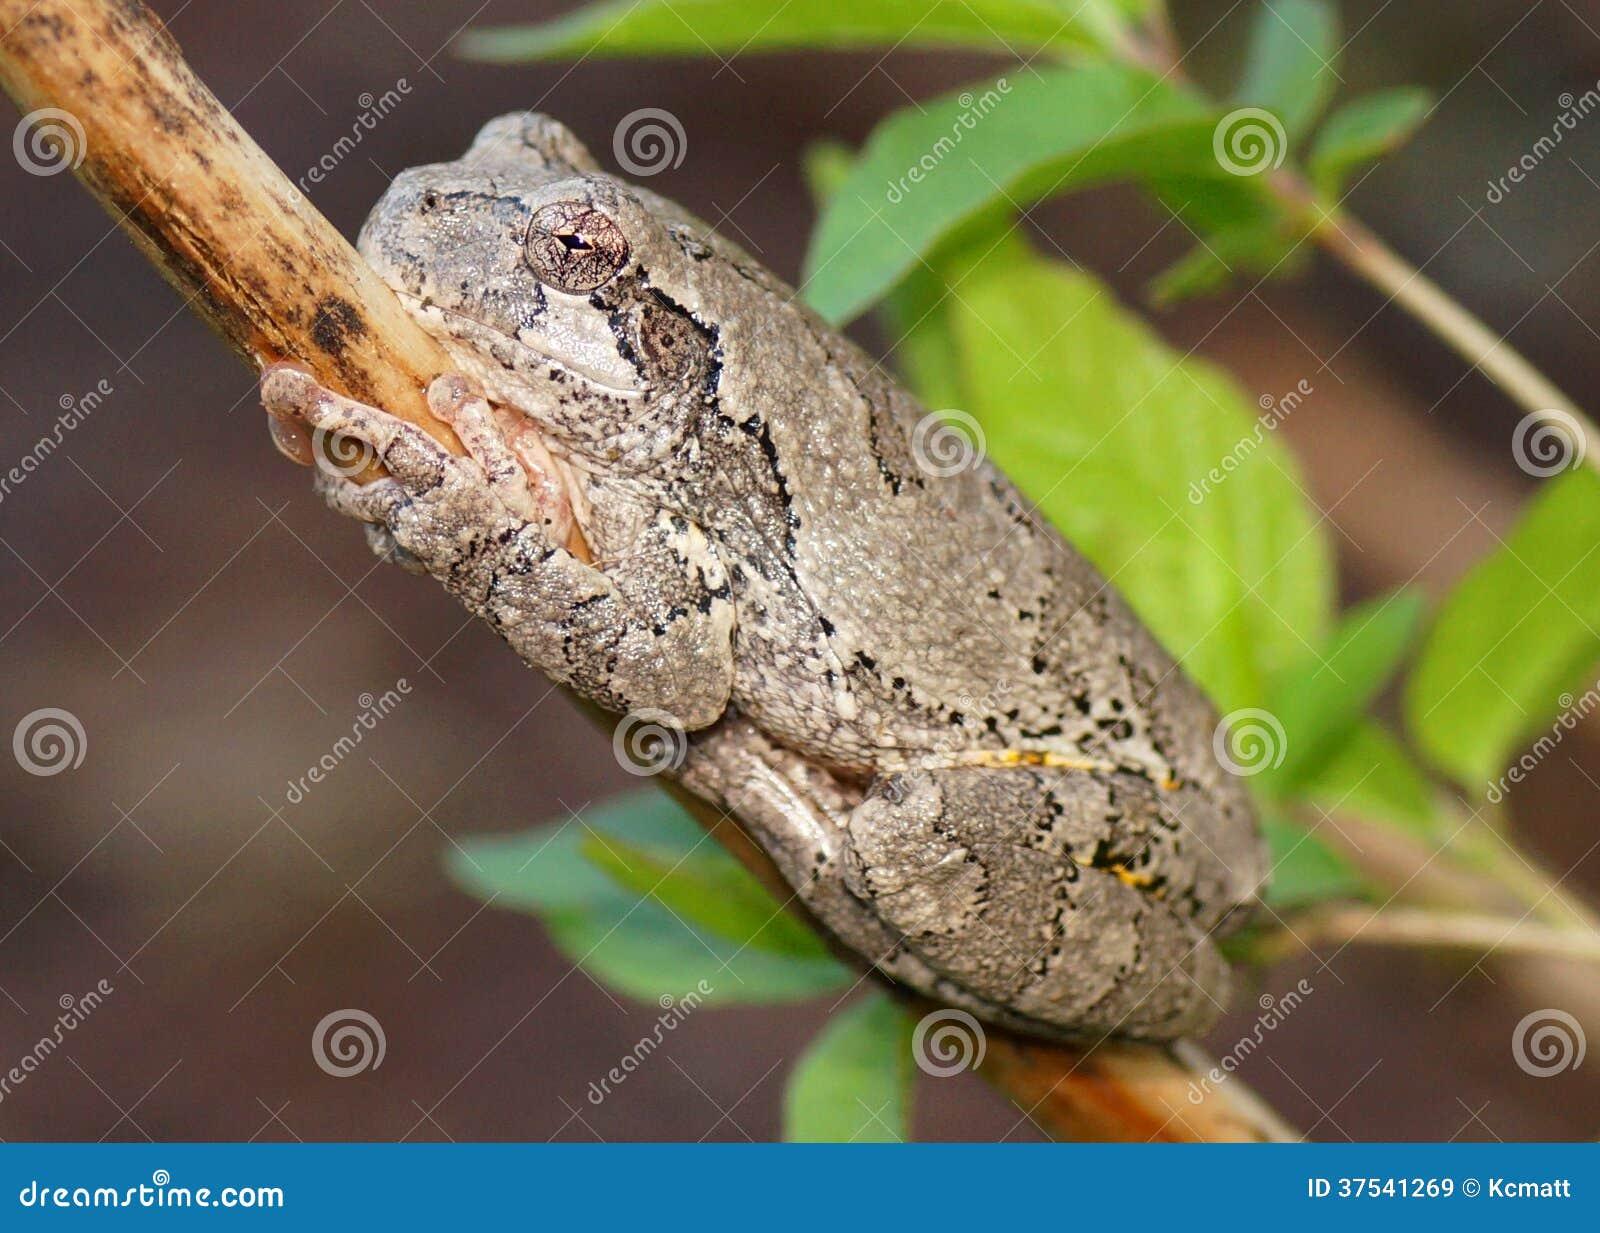 Gray Treefrog or Tree Frog, Hyla versicolor